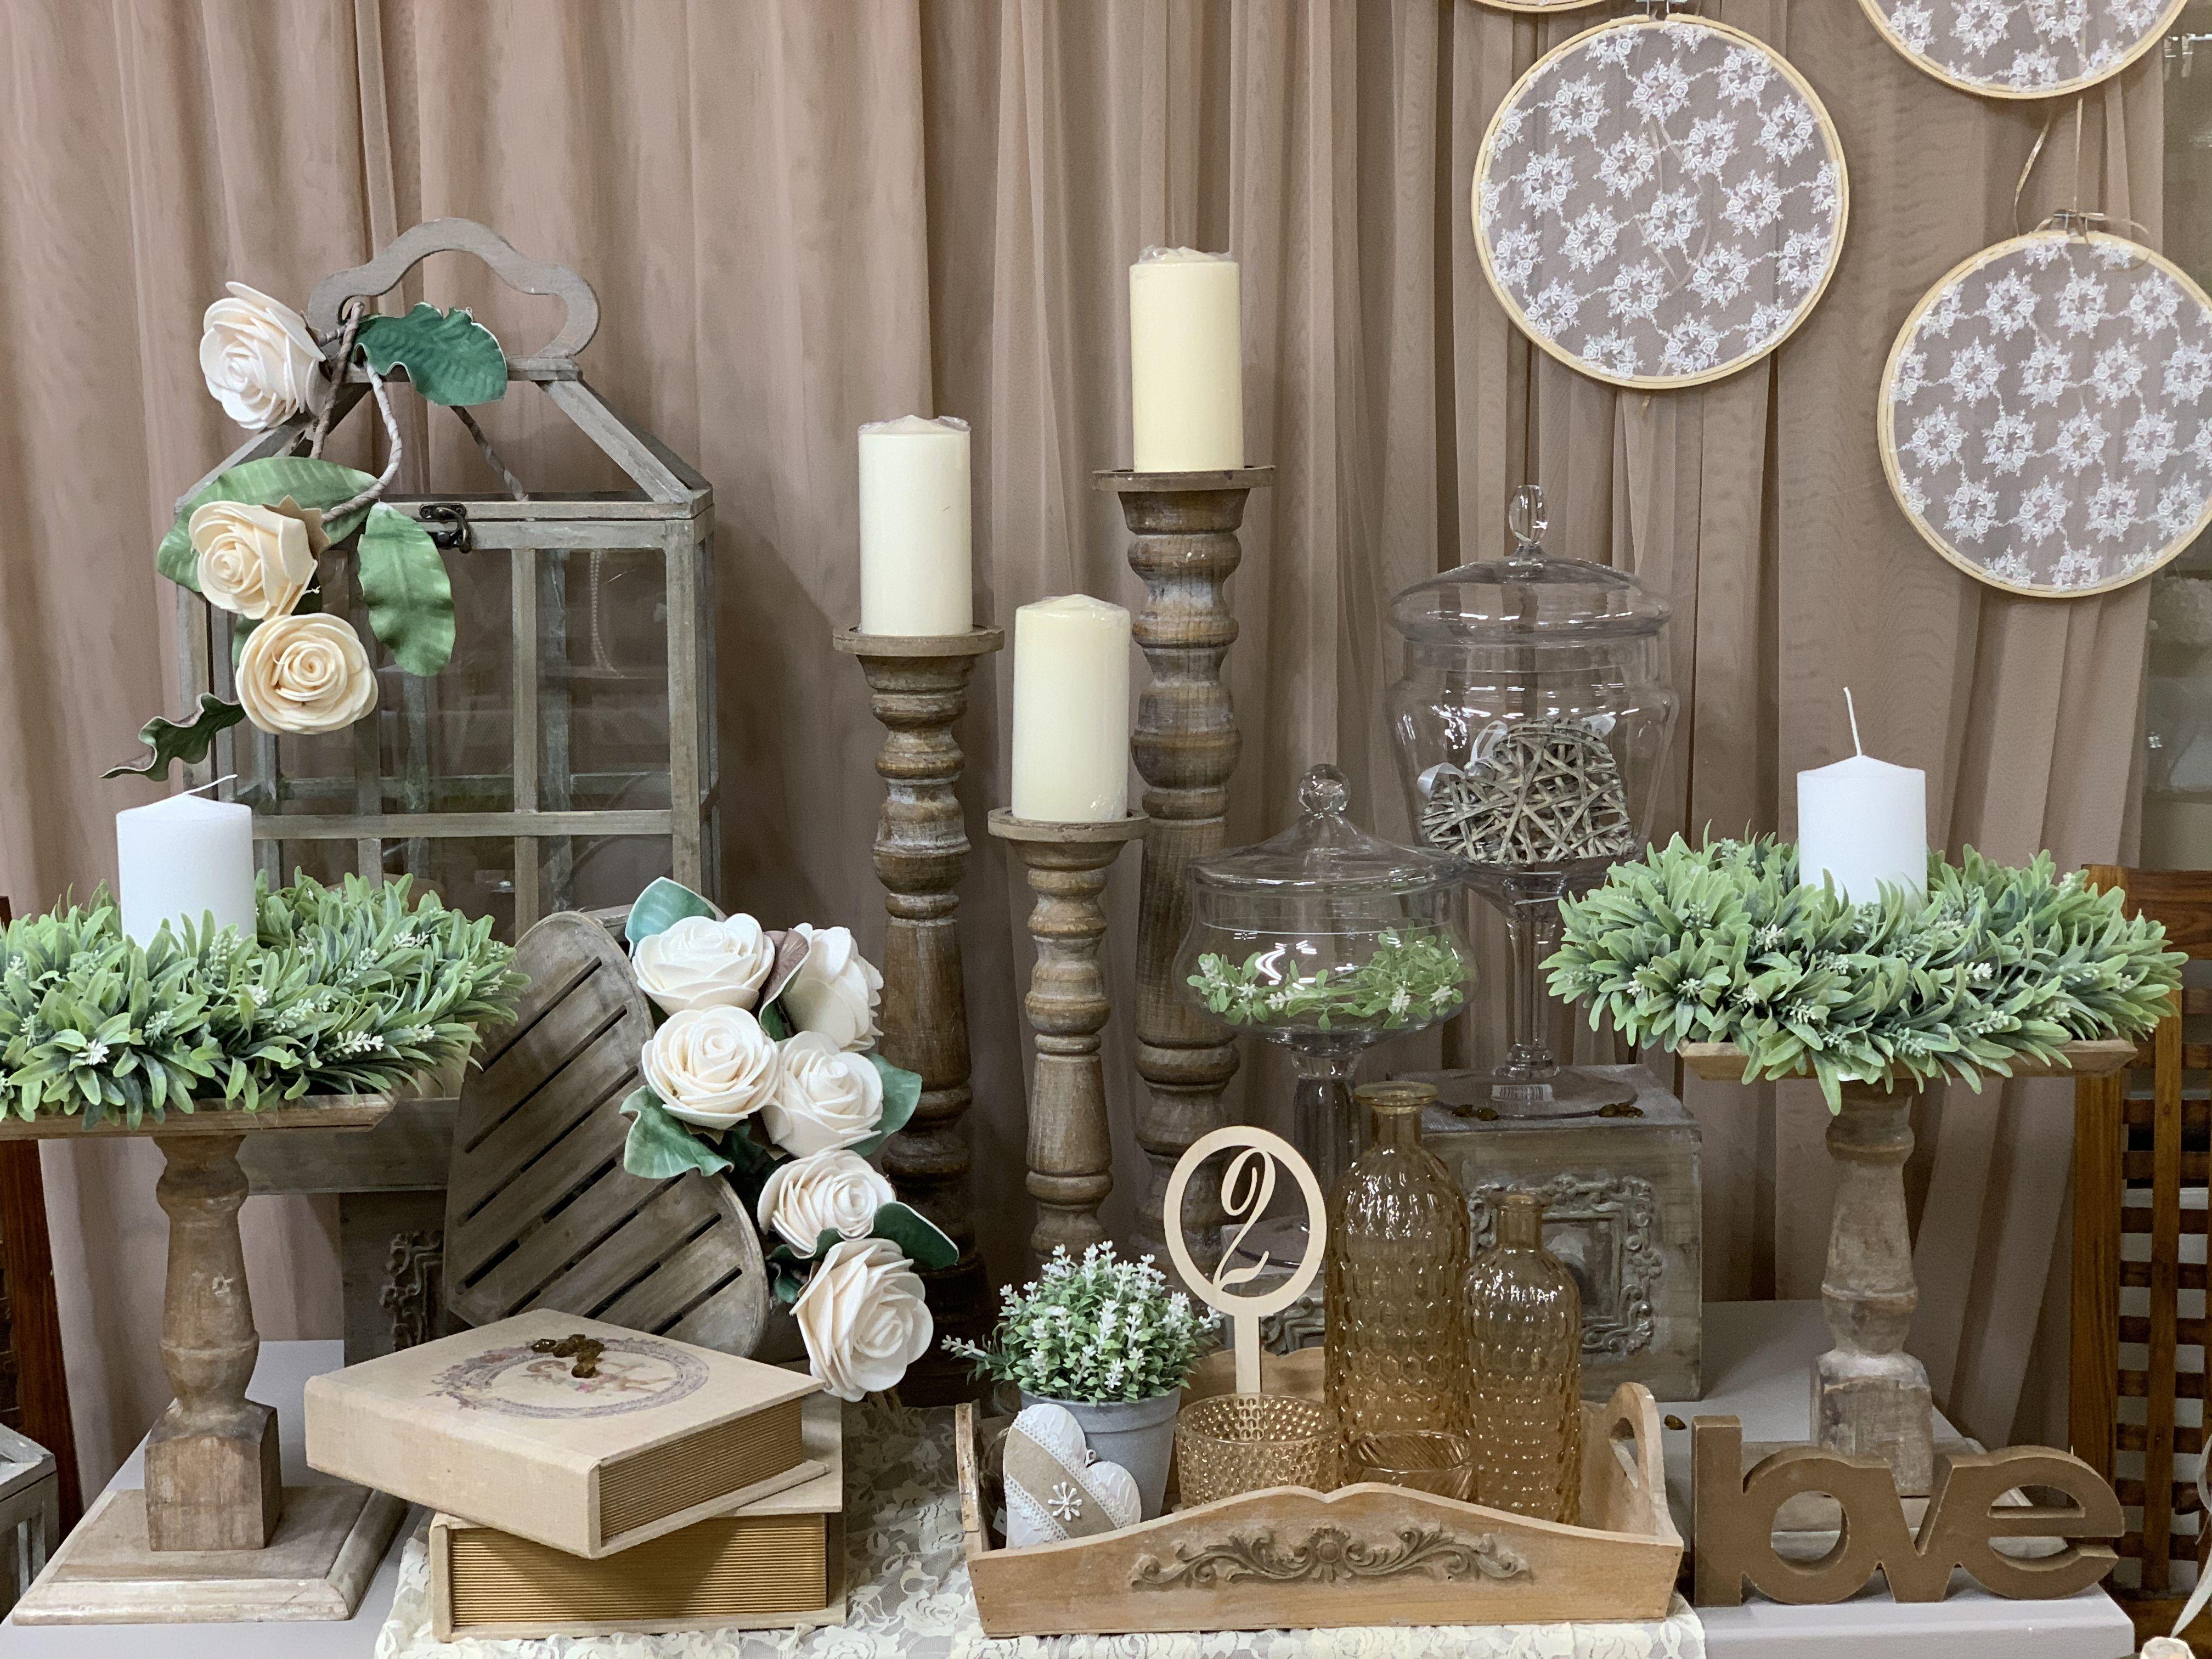 #wedding #tabledecoration #vintage style #decorideas #diy #karamanolis